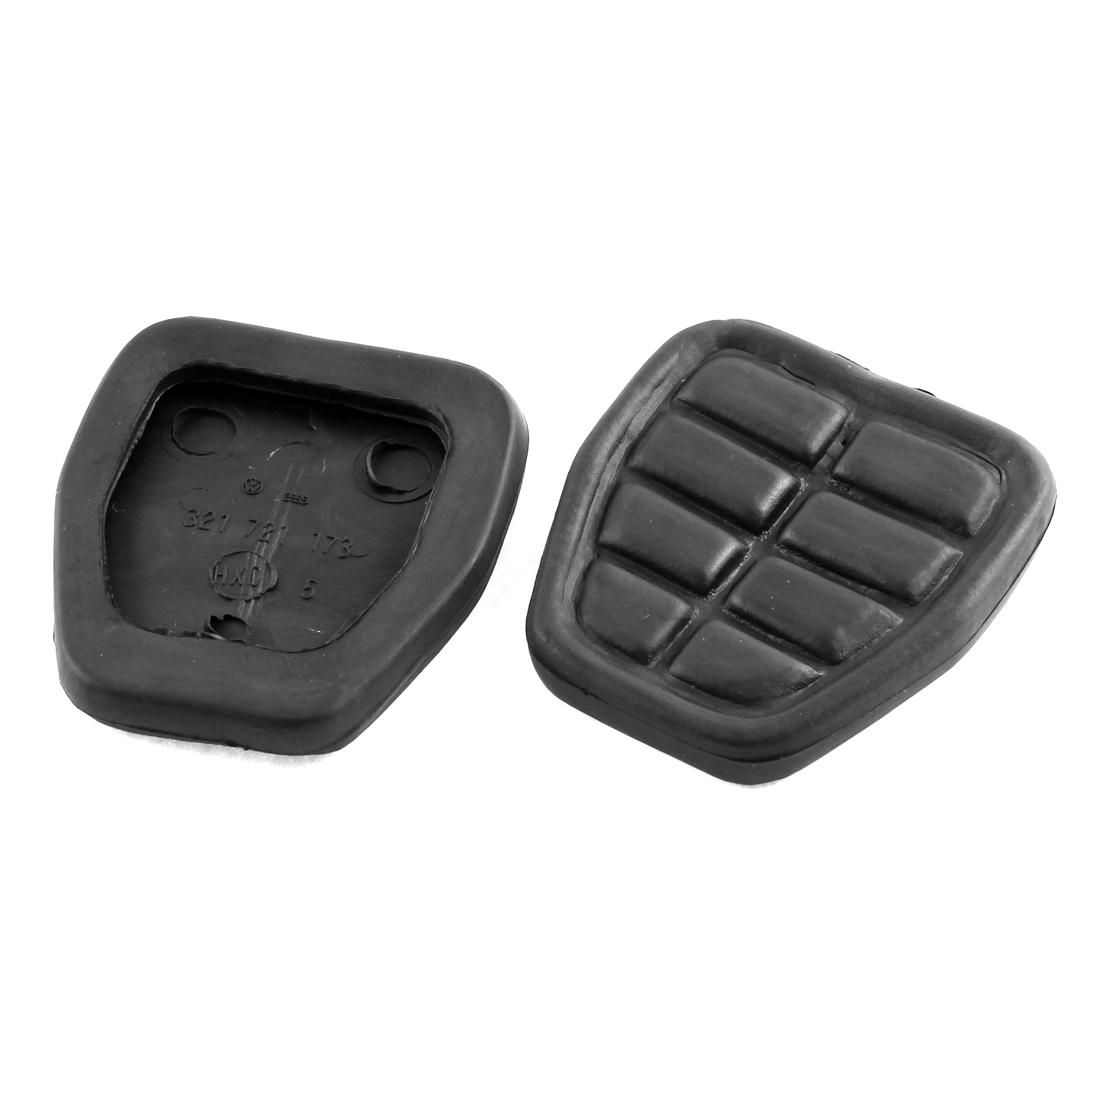 Clutch Brake Pedal Pad Rubber Set 321721173 2 Pcs for Audi 80